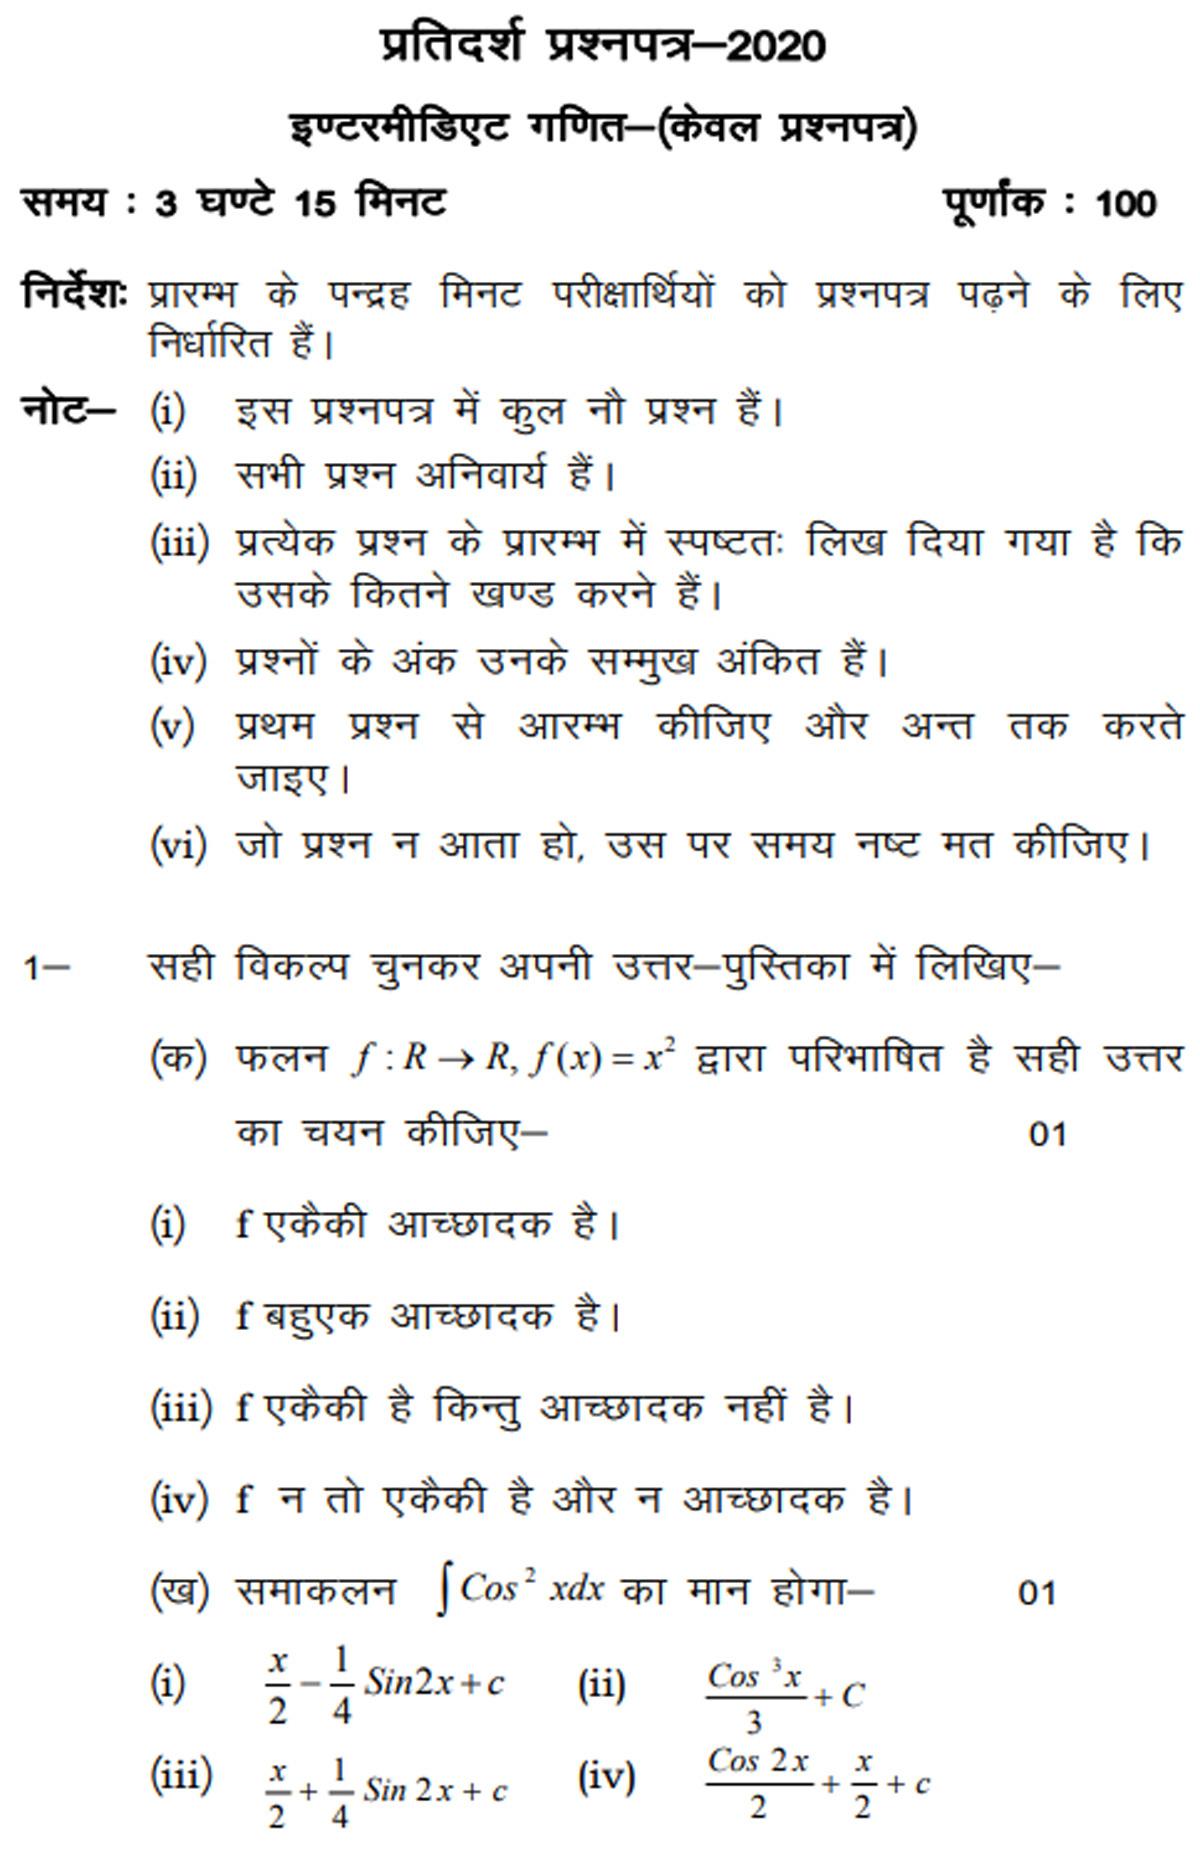 1. UP Board Class 12th Maths Model Test Paper